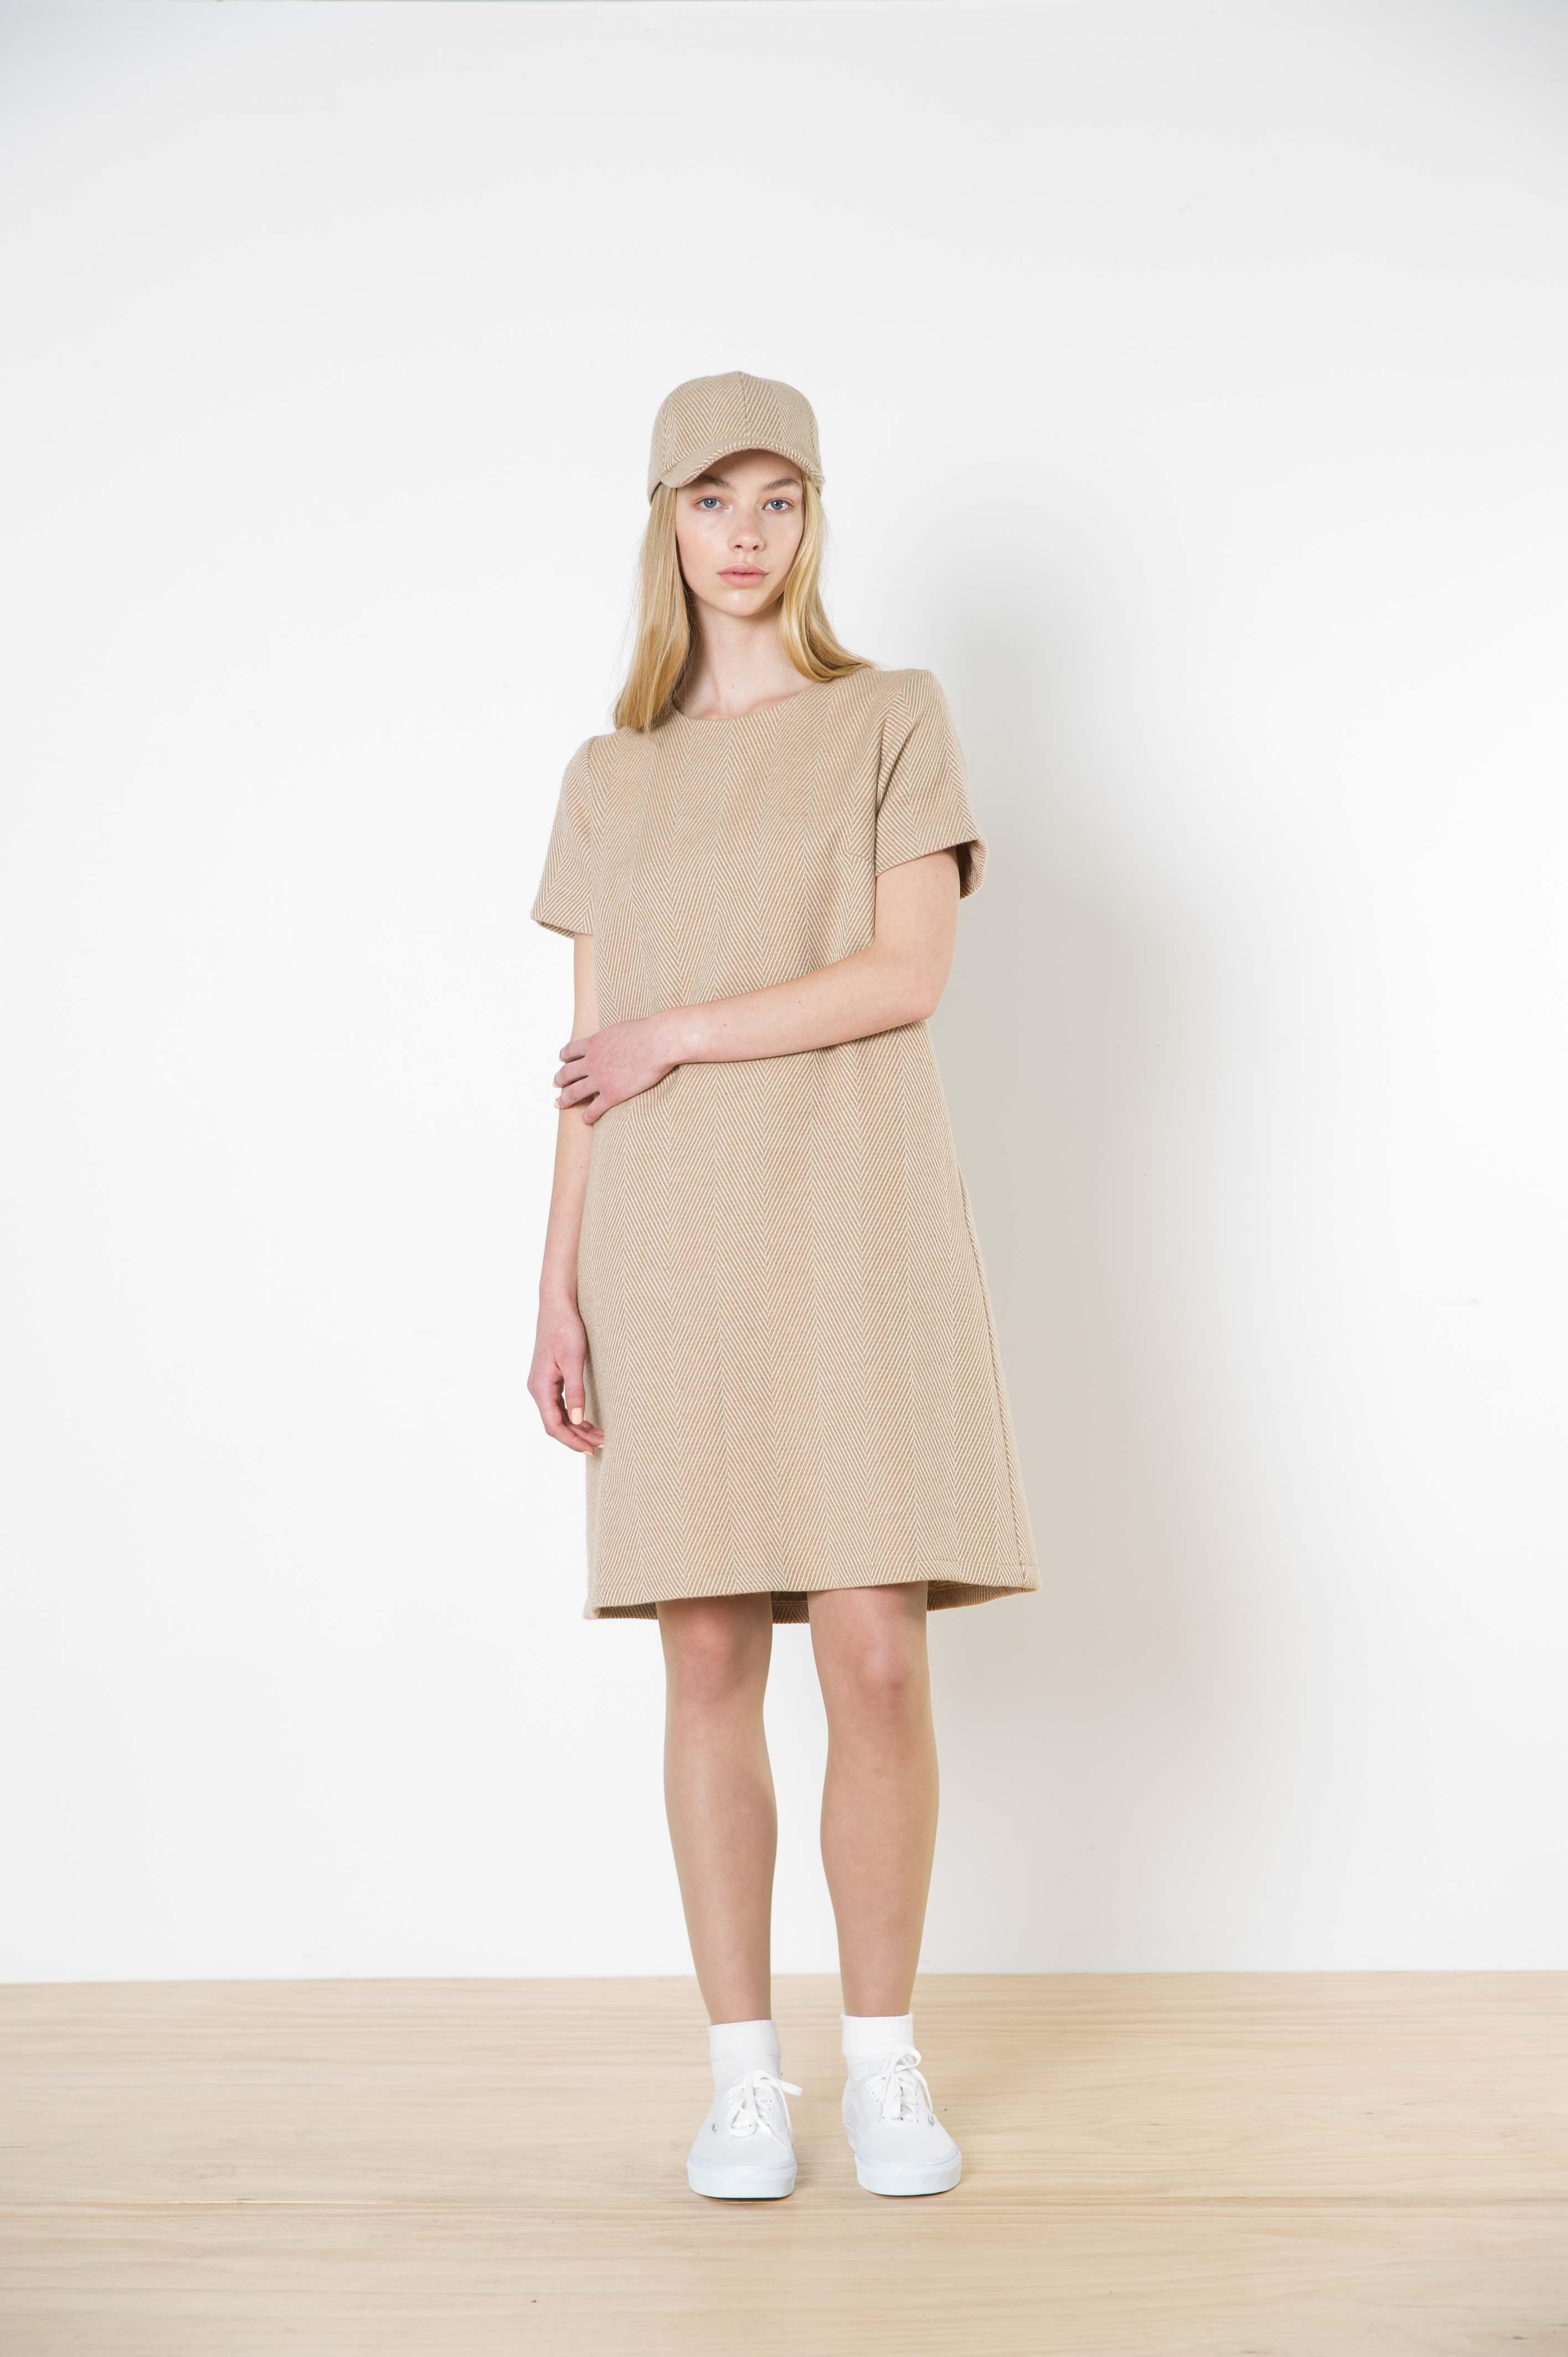 48 franca t-shirt dress